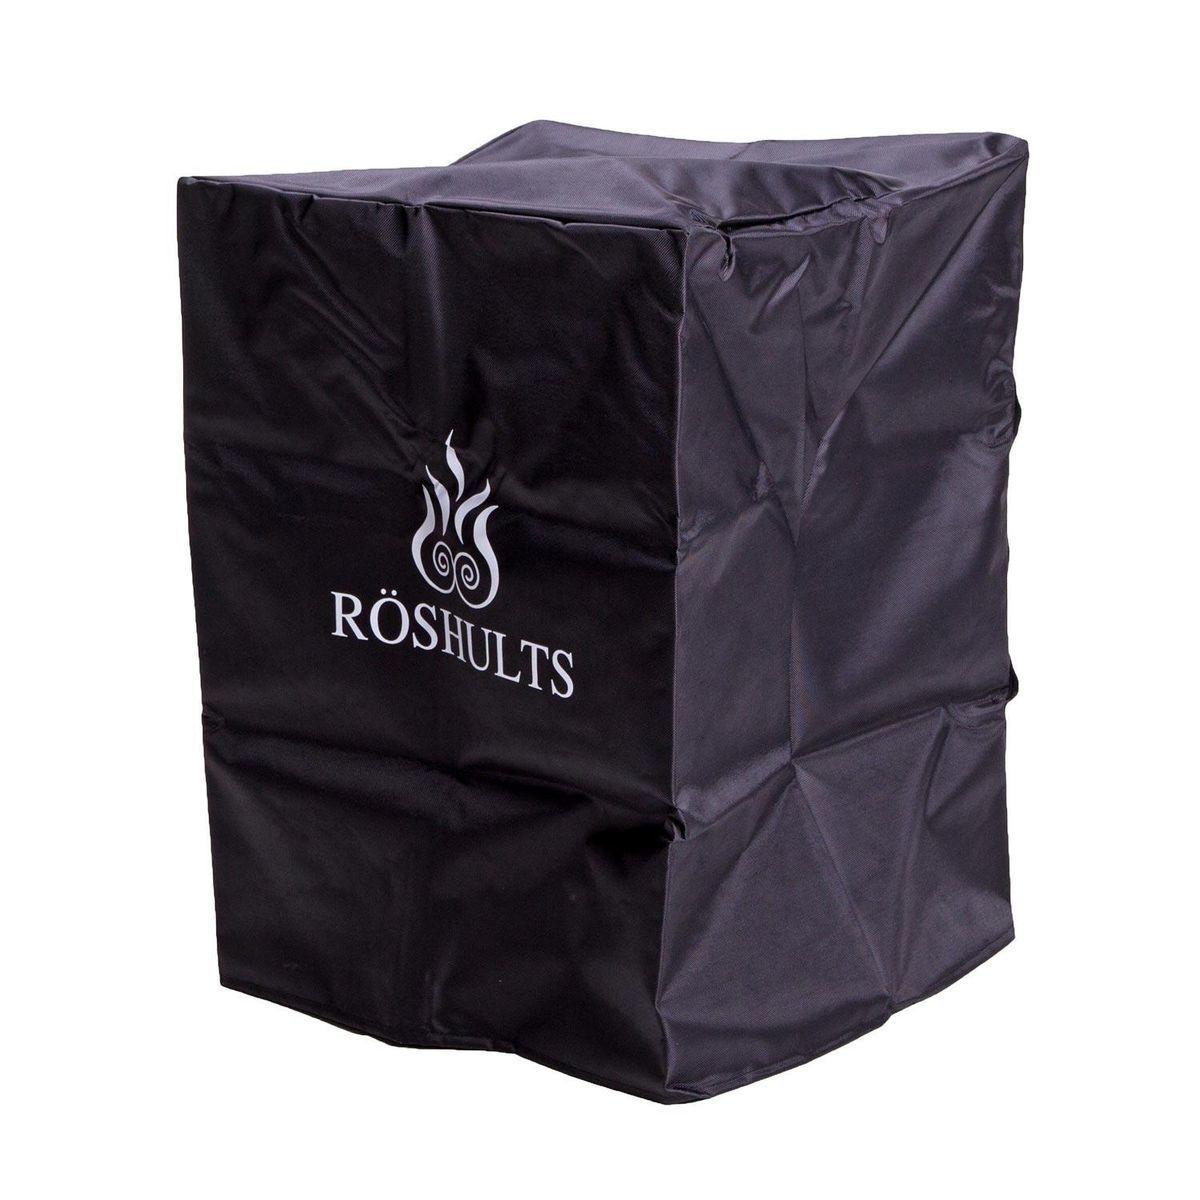 r shults garten sideboard r shults. Black Bedroom Furniture Sets. Home Design Ideas